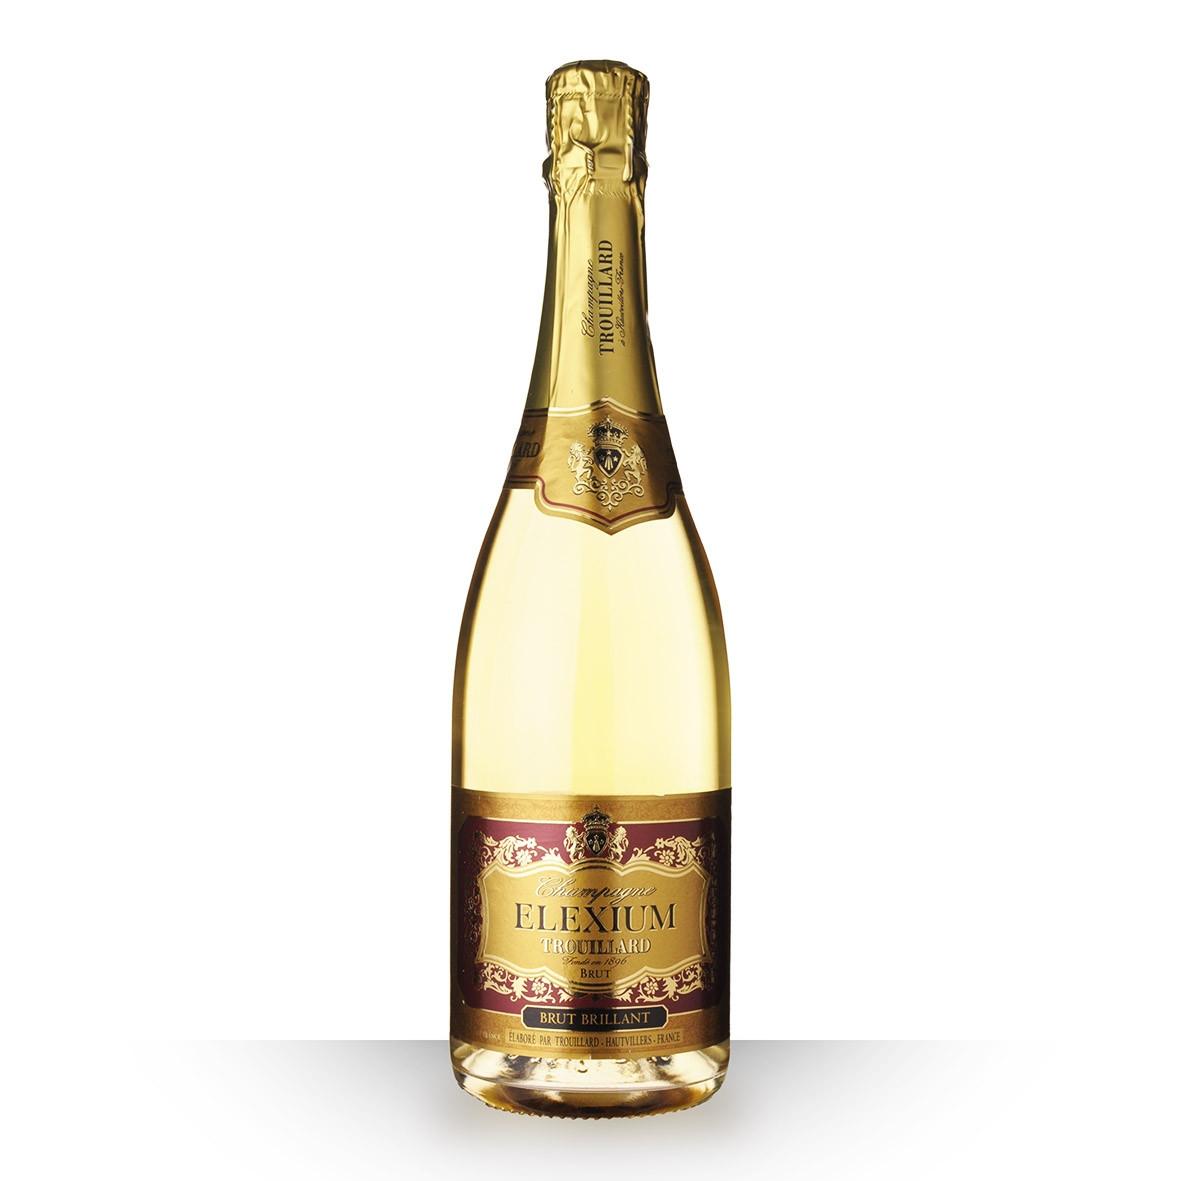 Champagne Trouillard Elexium Brut Brillant 75cl www.odyssee-vins.com